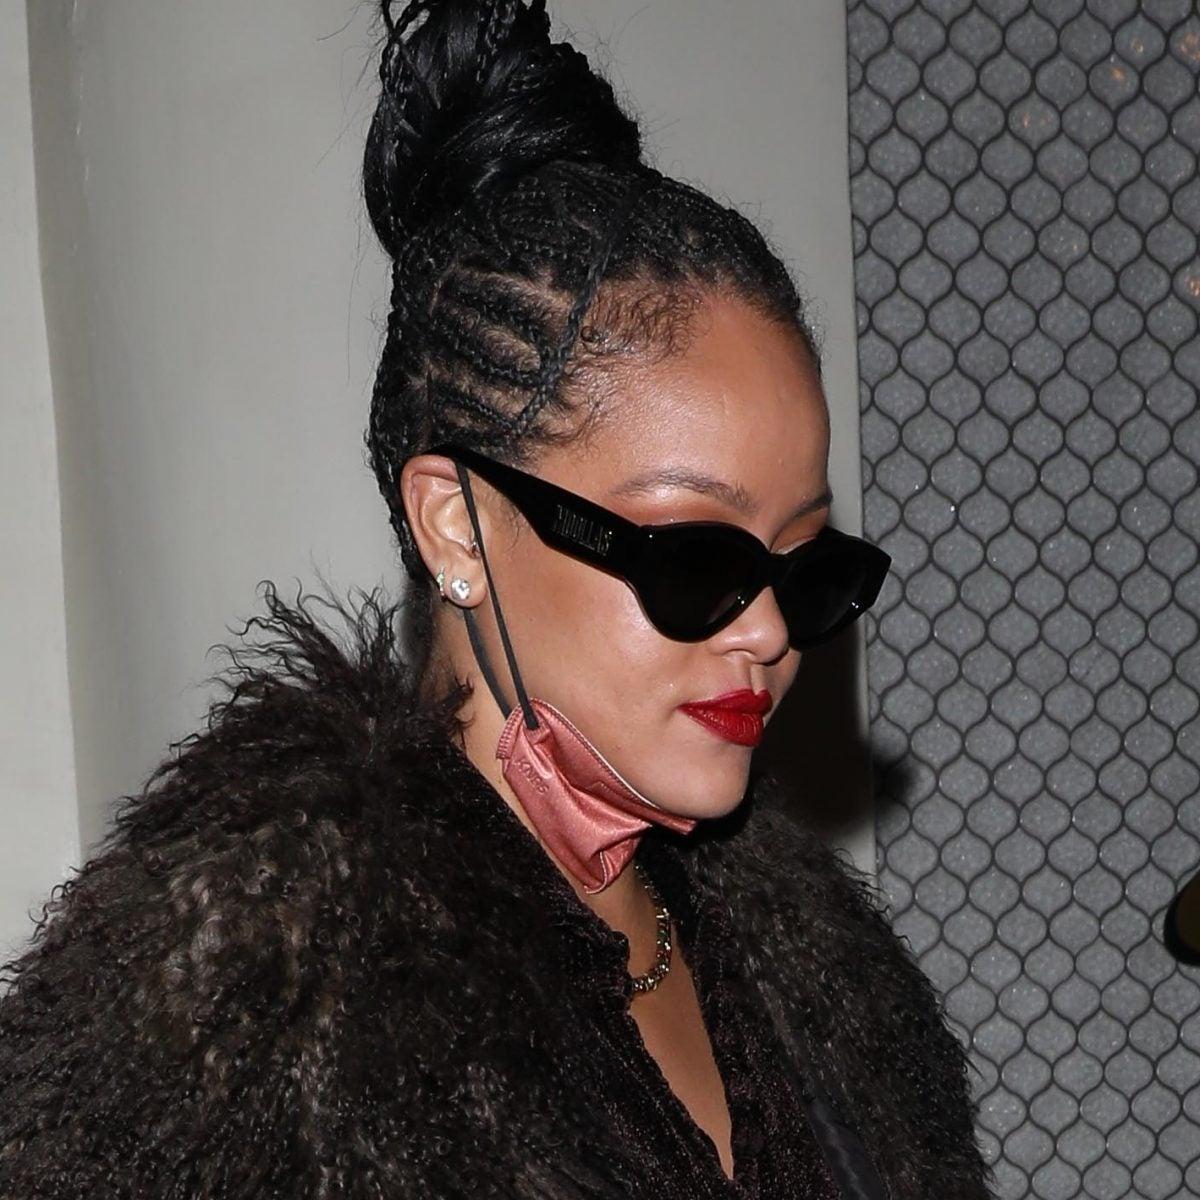 Rihanna Is Back Again With Her Street Style Slay